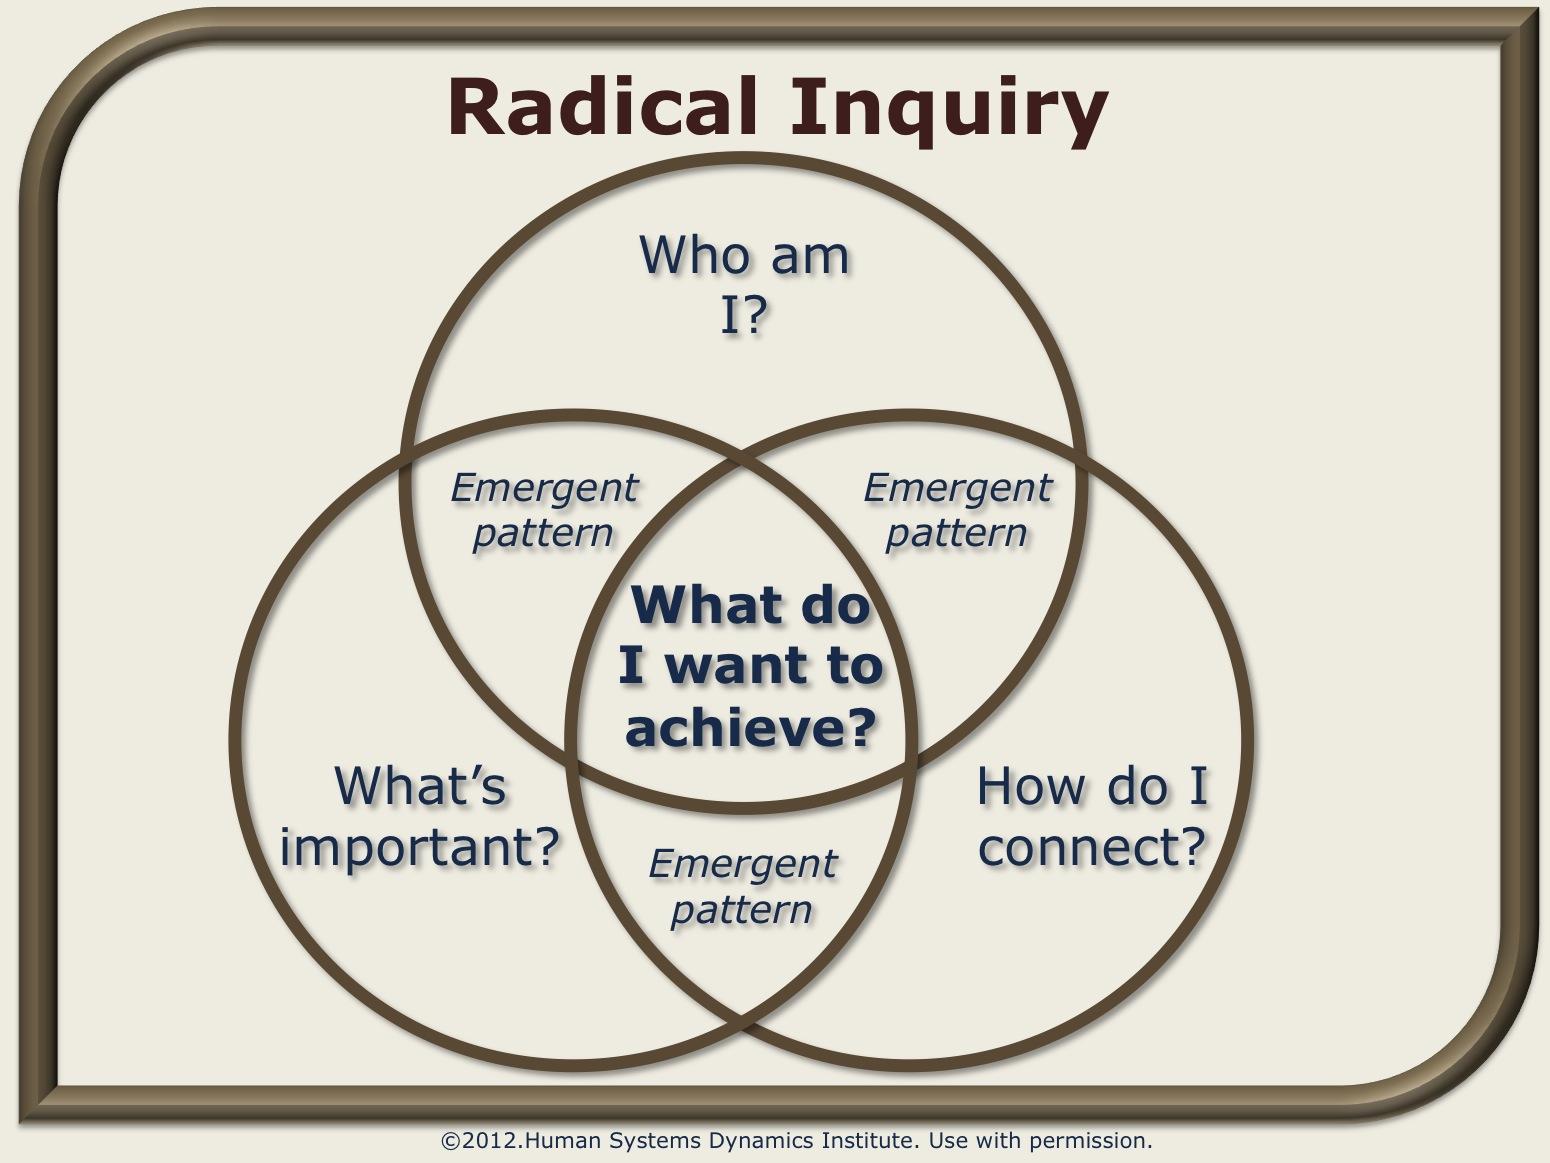 Radicalinquiryg1345732823 radical inquiry ccuart Gallery